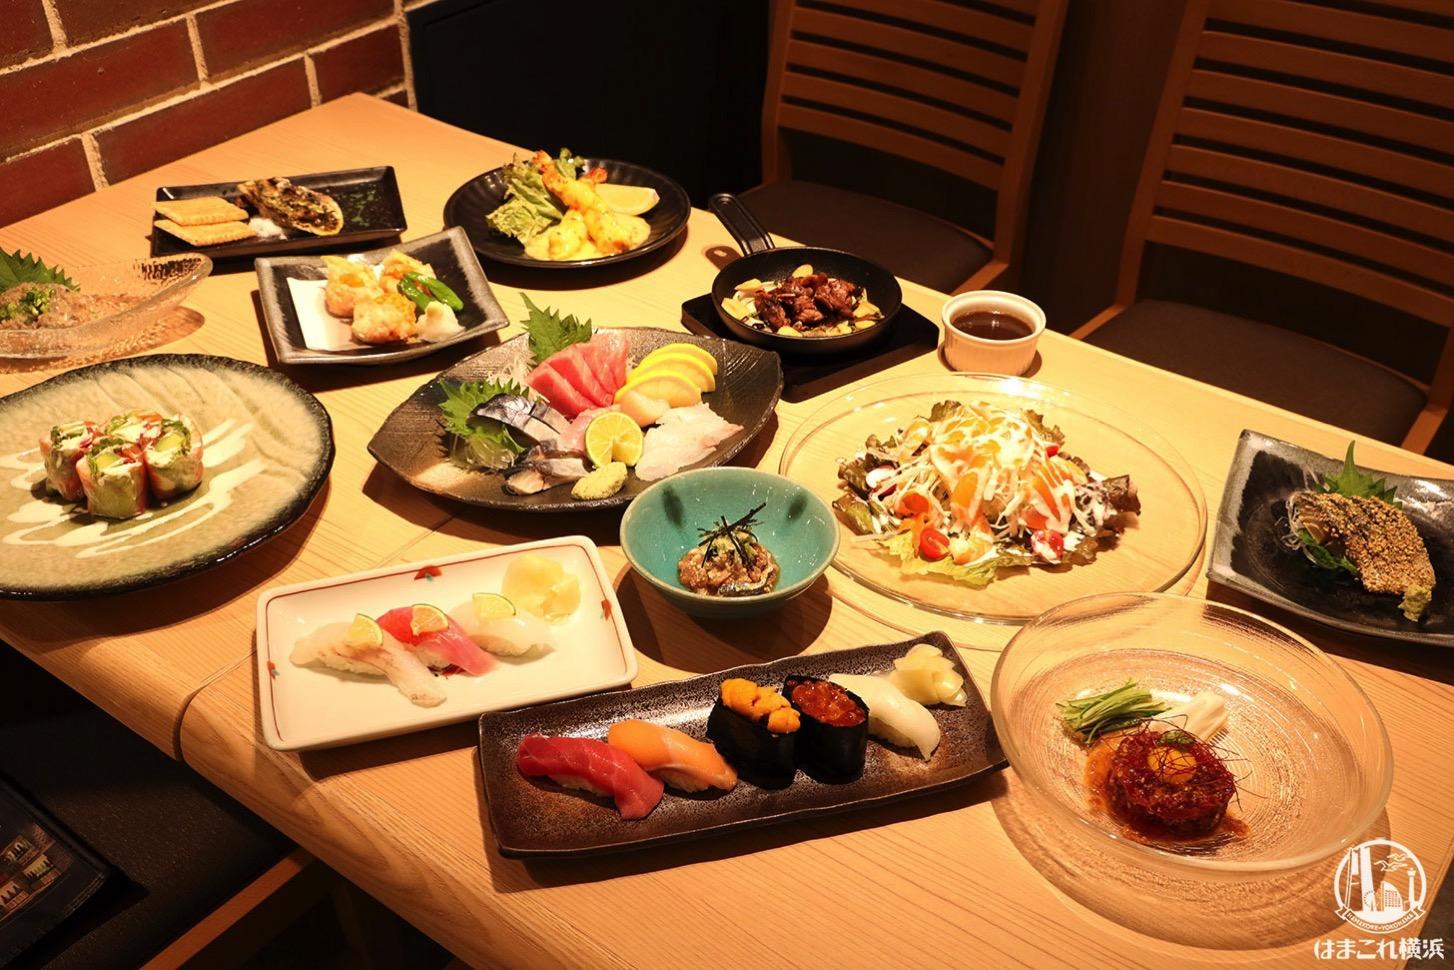 寿司&日本酒バー「横浜すし好」各種料理